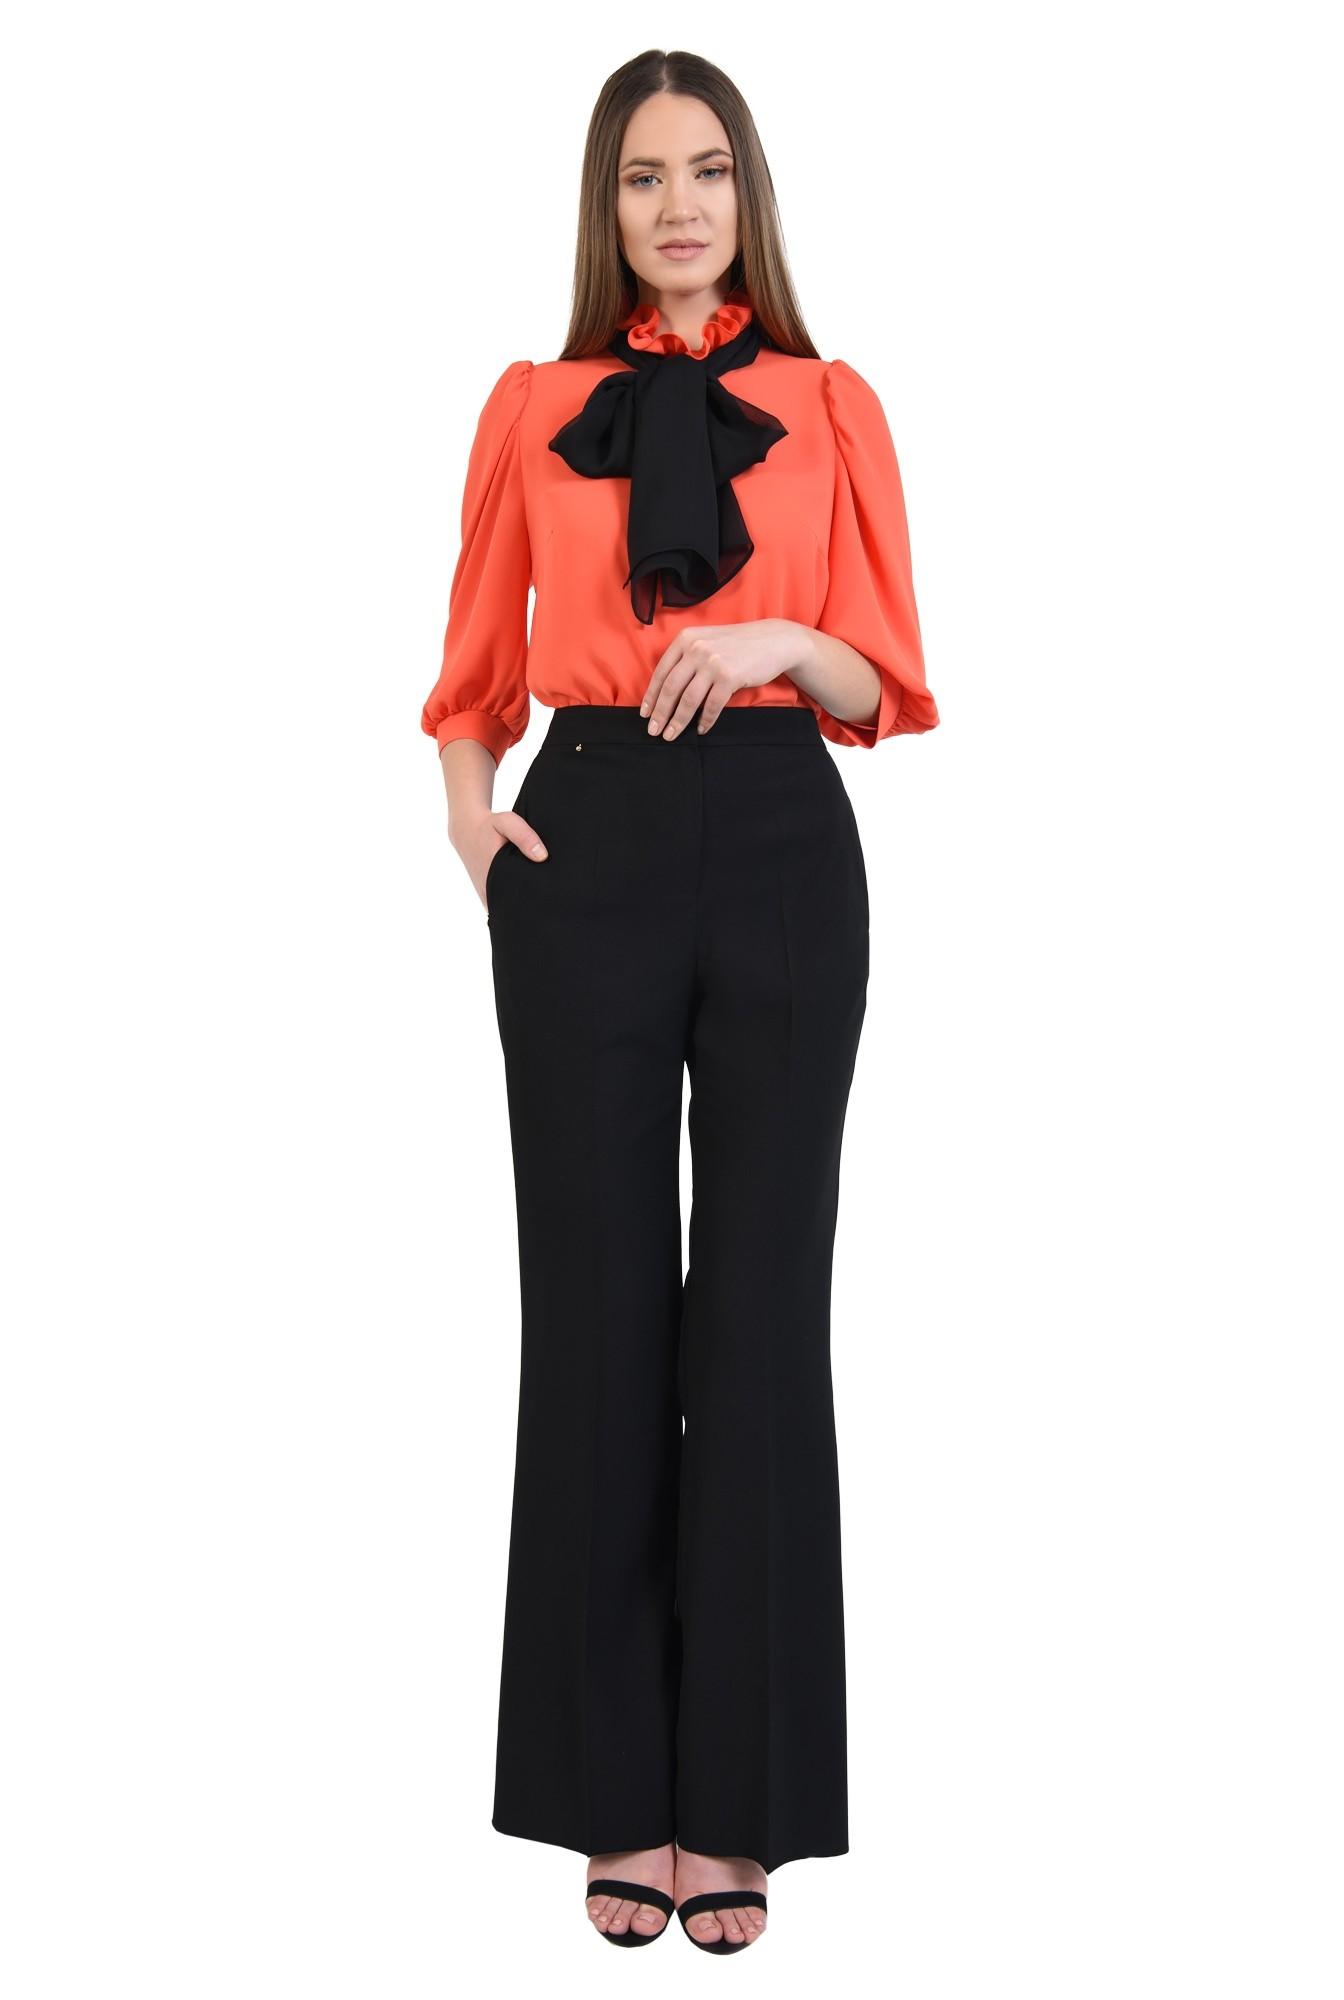 360 - bluza eleganta, maneci 3/4 cu mansete, funda neagra, bluza din sifon